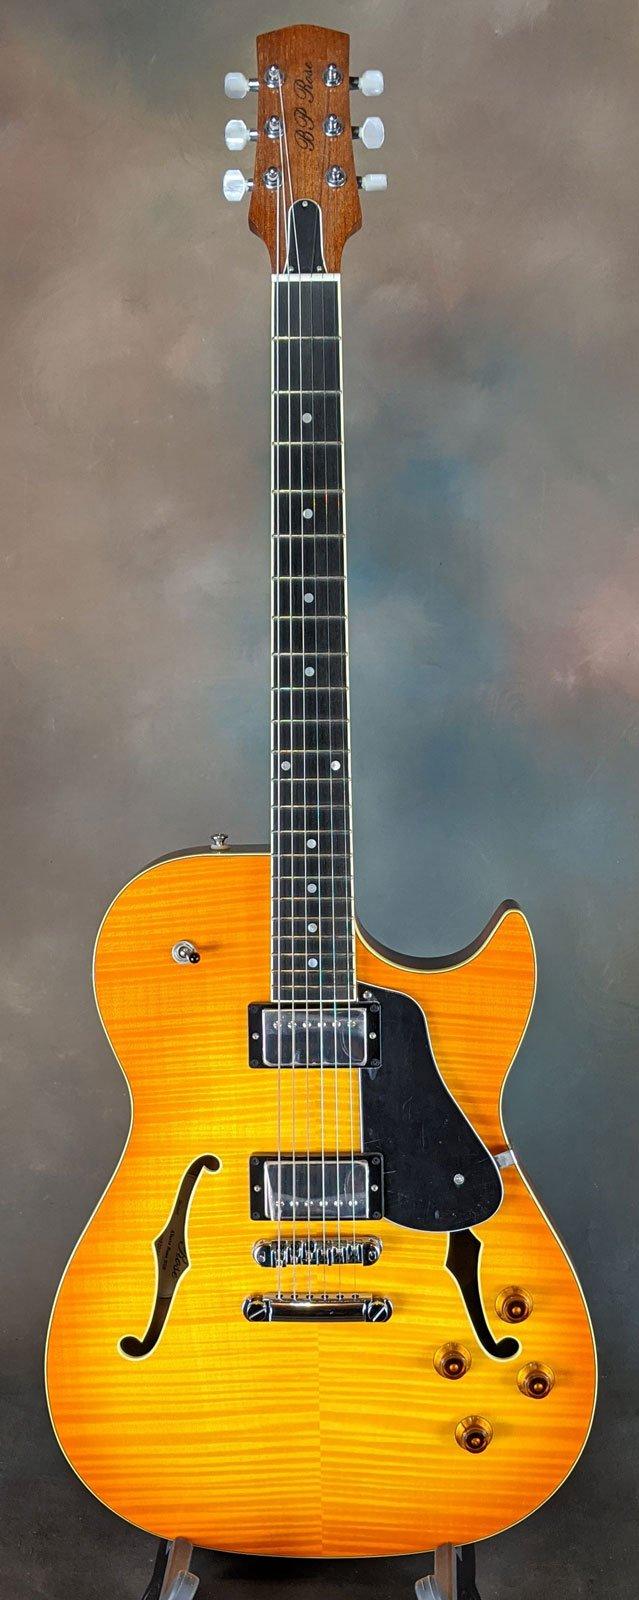 BP Rose Alexis Semi-hollowbody Electric Guitar, Honey Sunburst